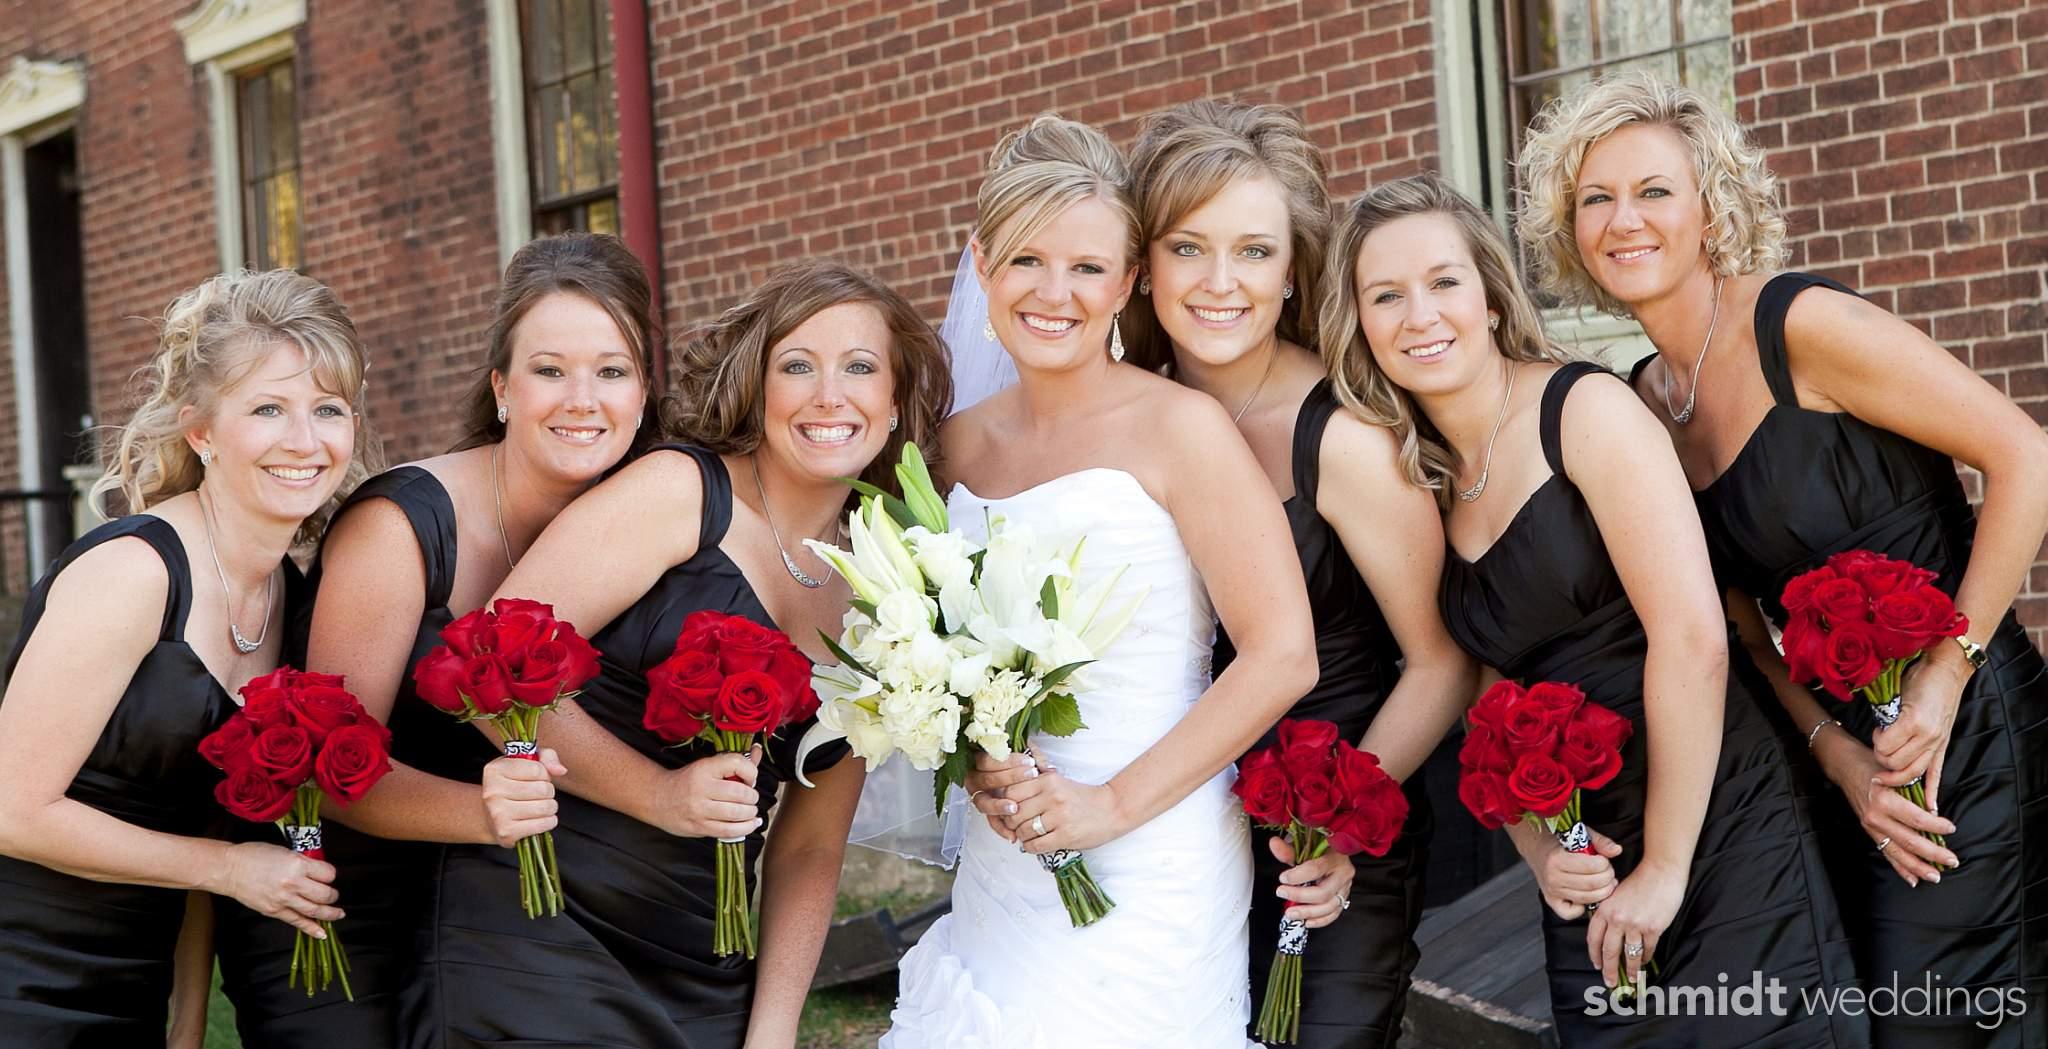 wedding bridal party photos outdoors schmidt weddings